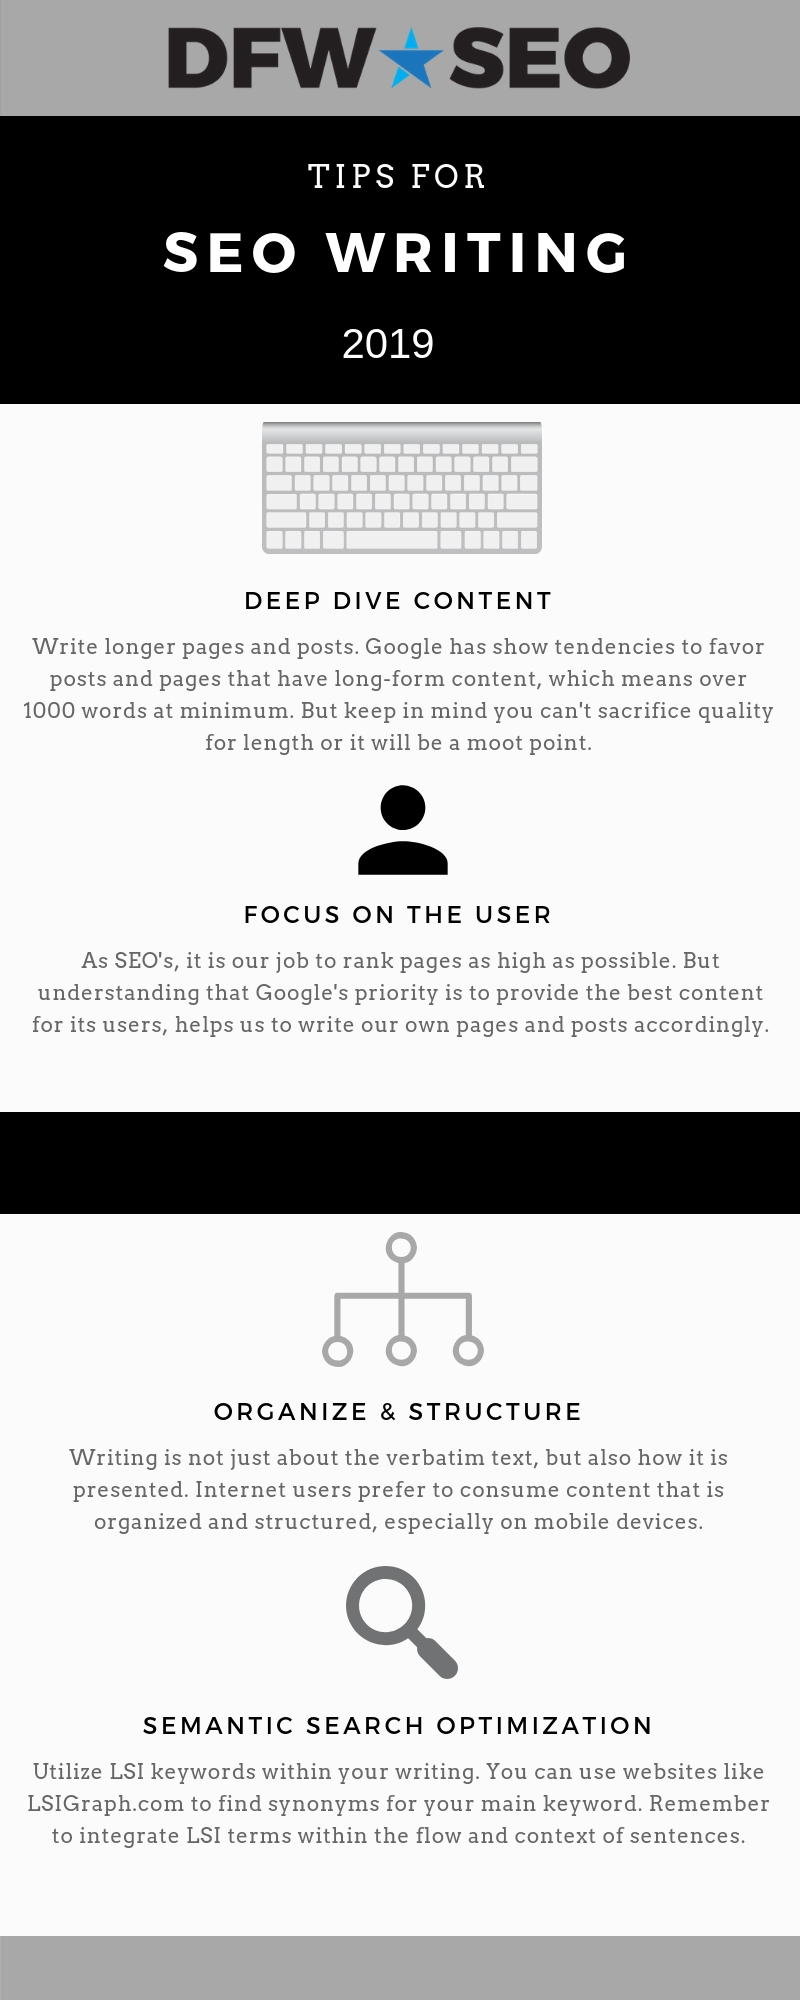 SEO Writing Tips 2019 Infographic